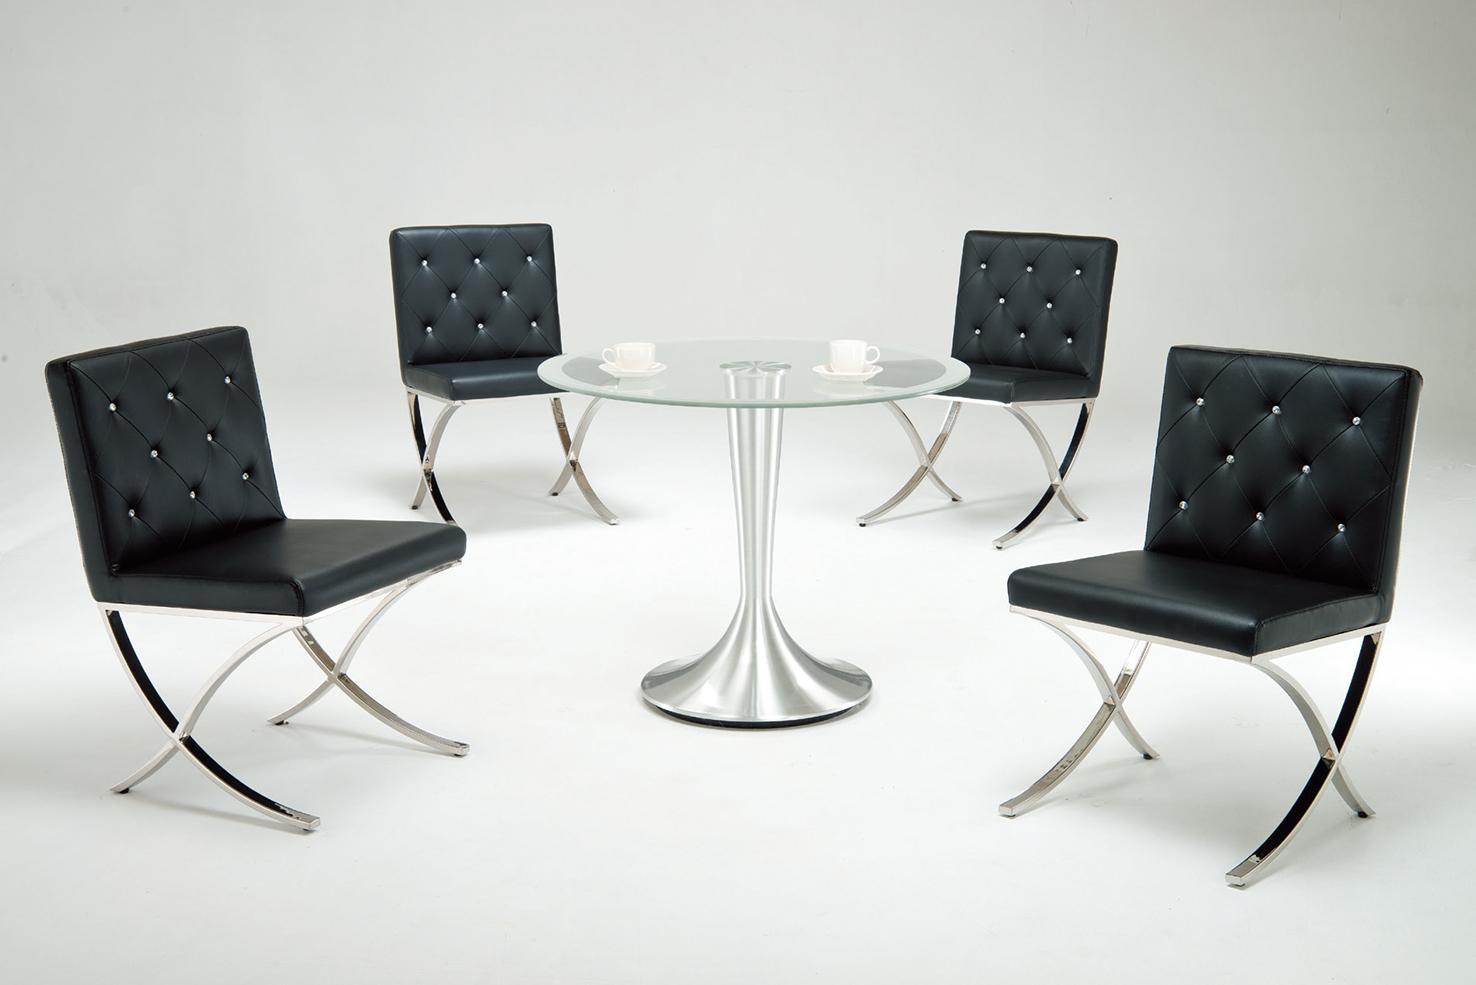 【 IS空間美學】造型90圓洽談圓桌+時尚貝拉晶鑽皮椅(1桌4椅)